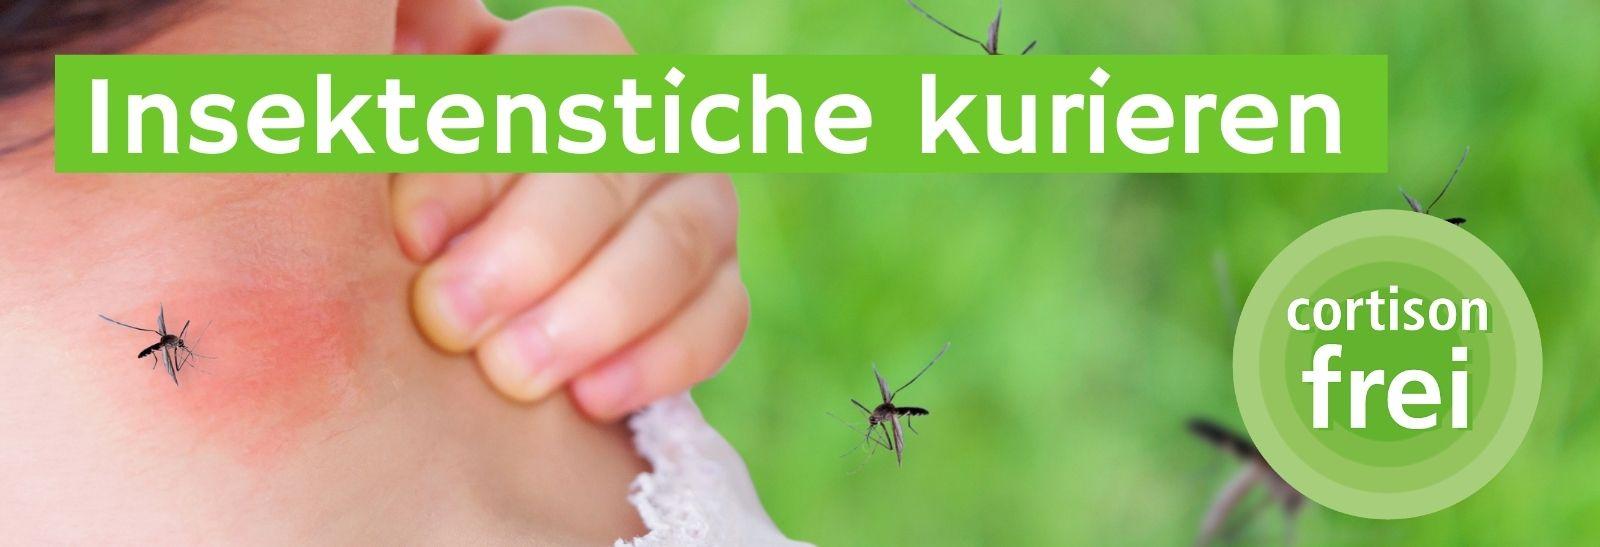 Insektenstiche kurieren cortisonfrei mirt Sensicutan